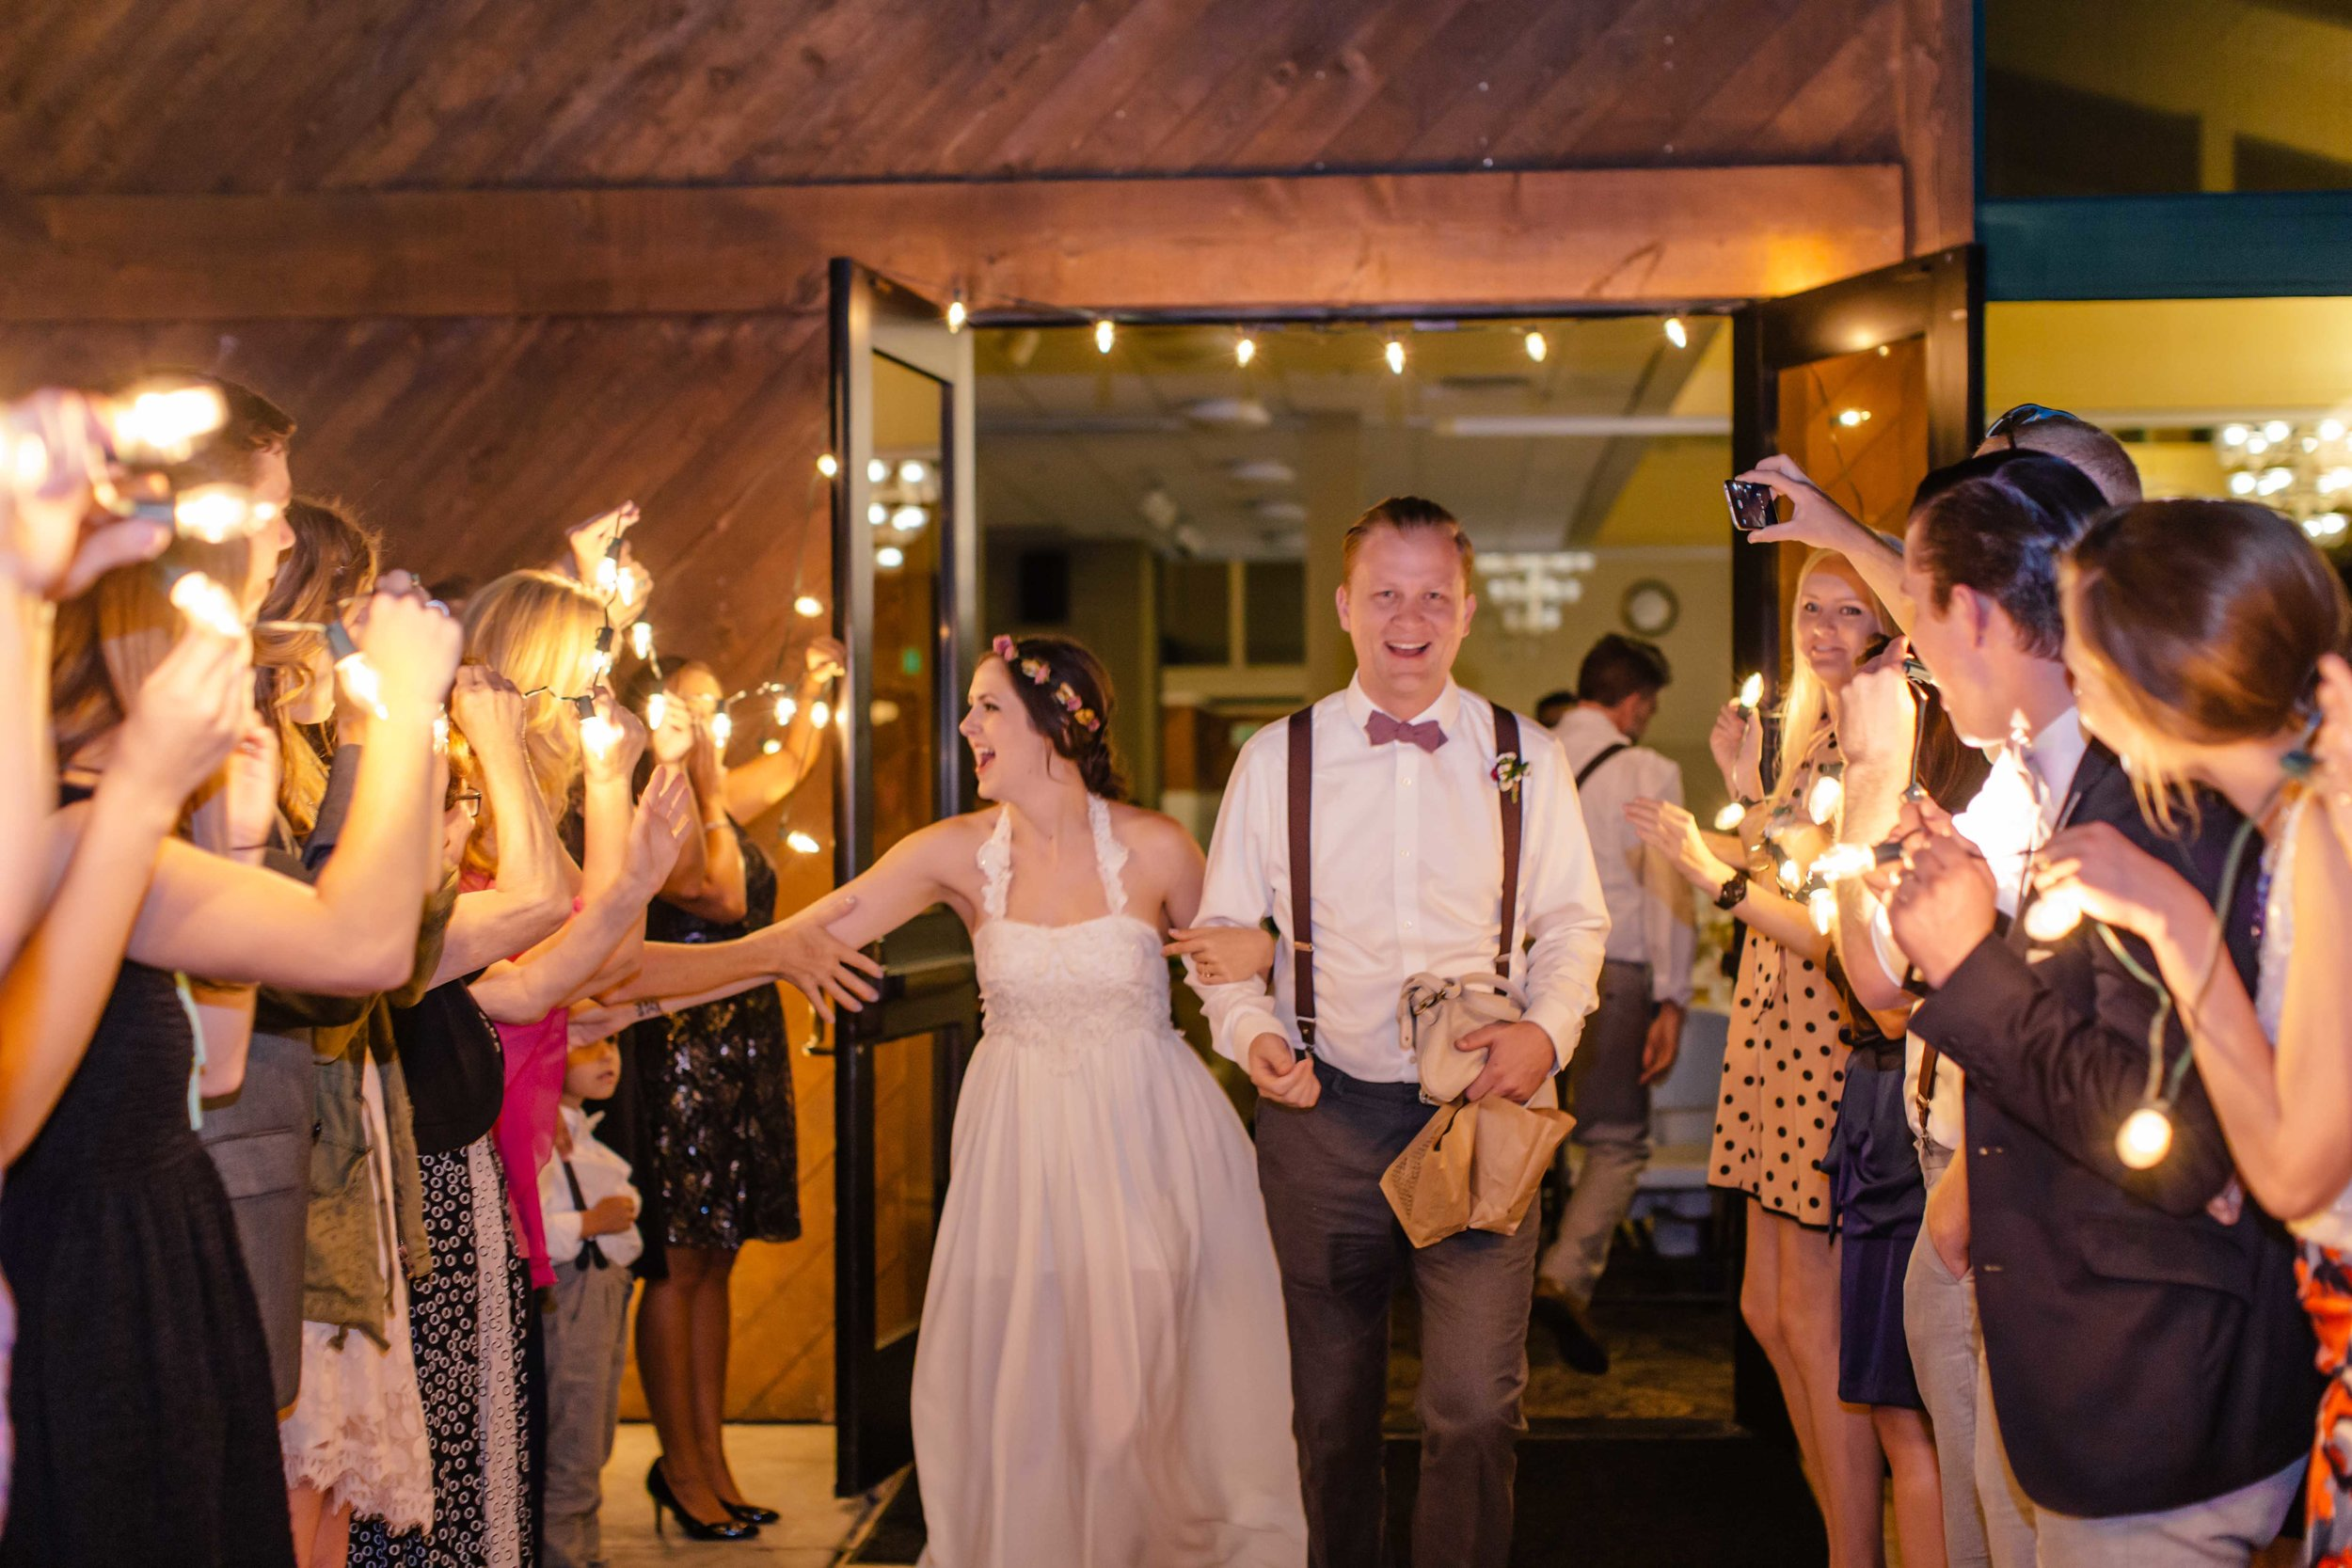 20141024-DePartee-Wedding-APavone-064-sm.jpg